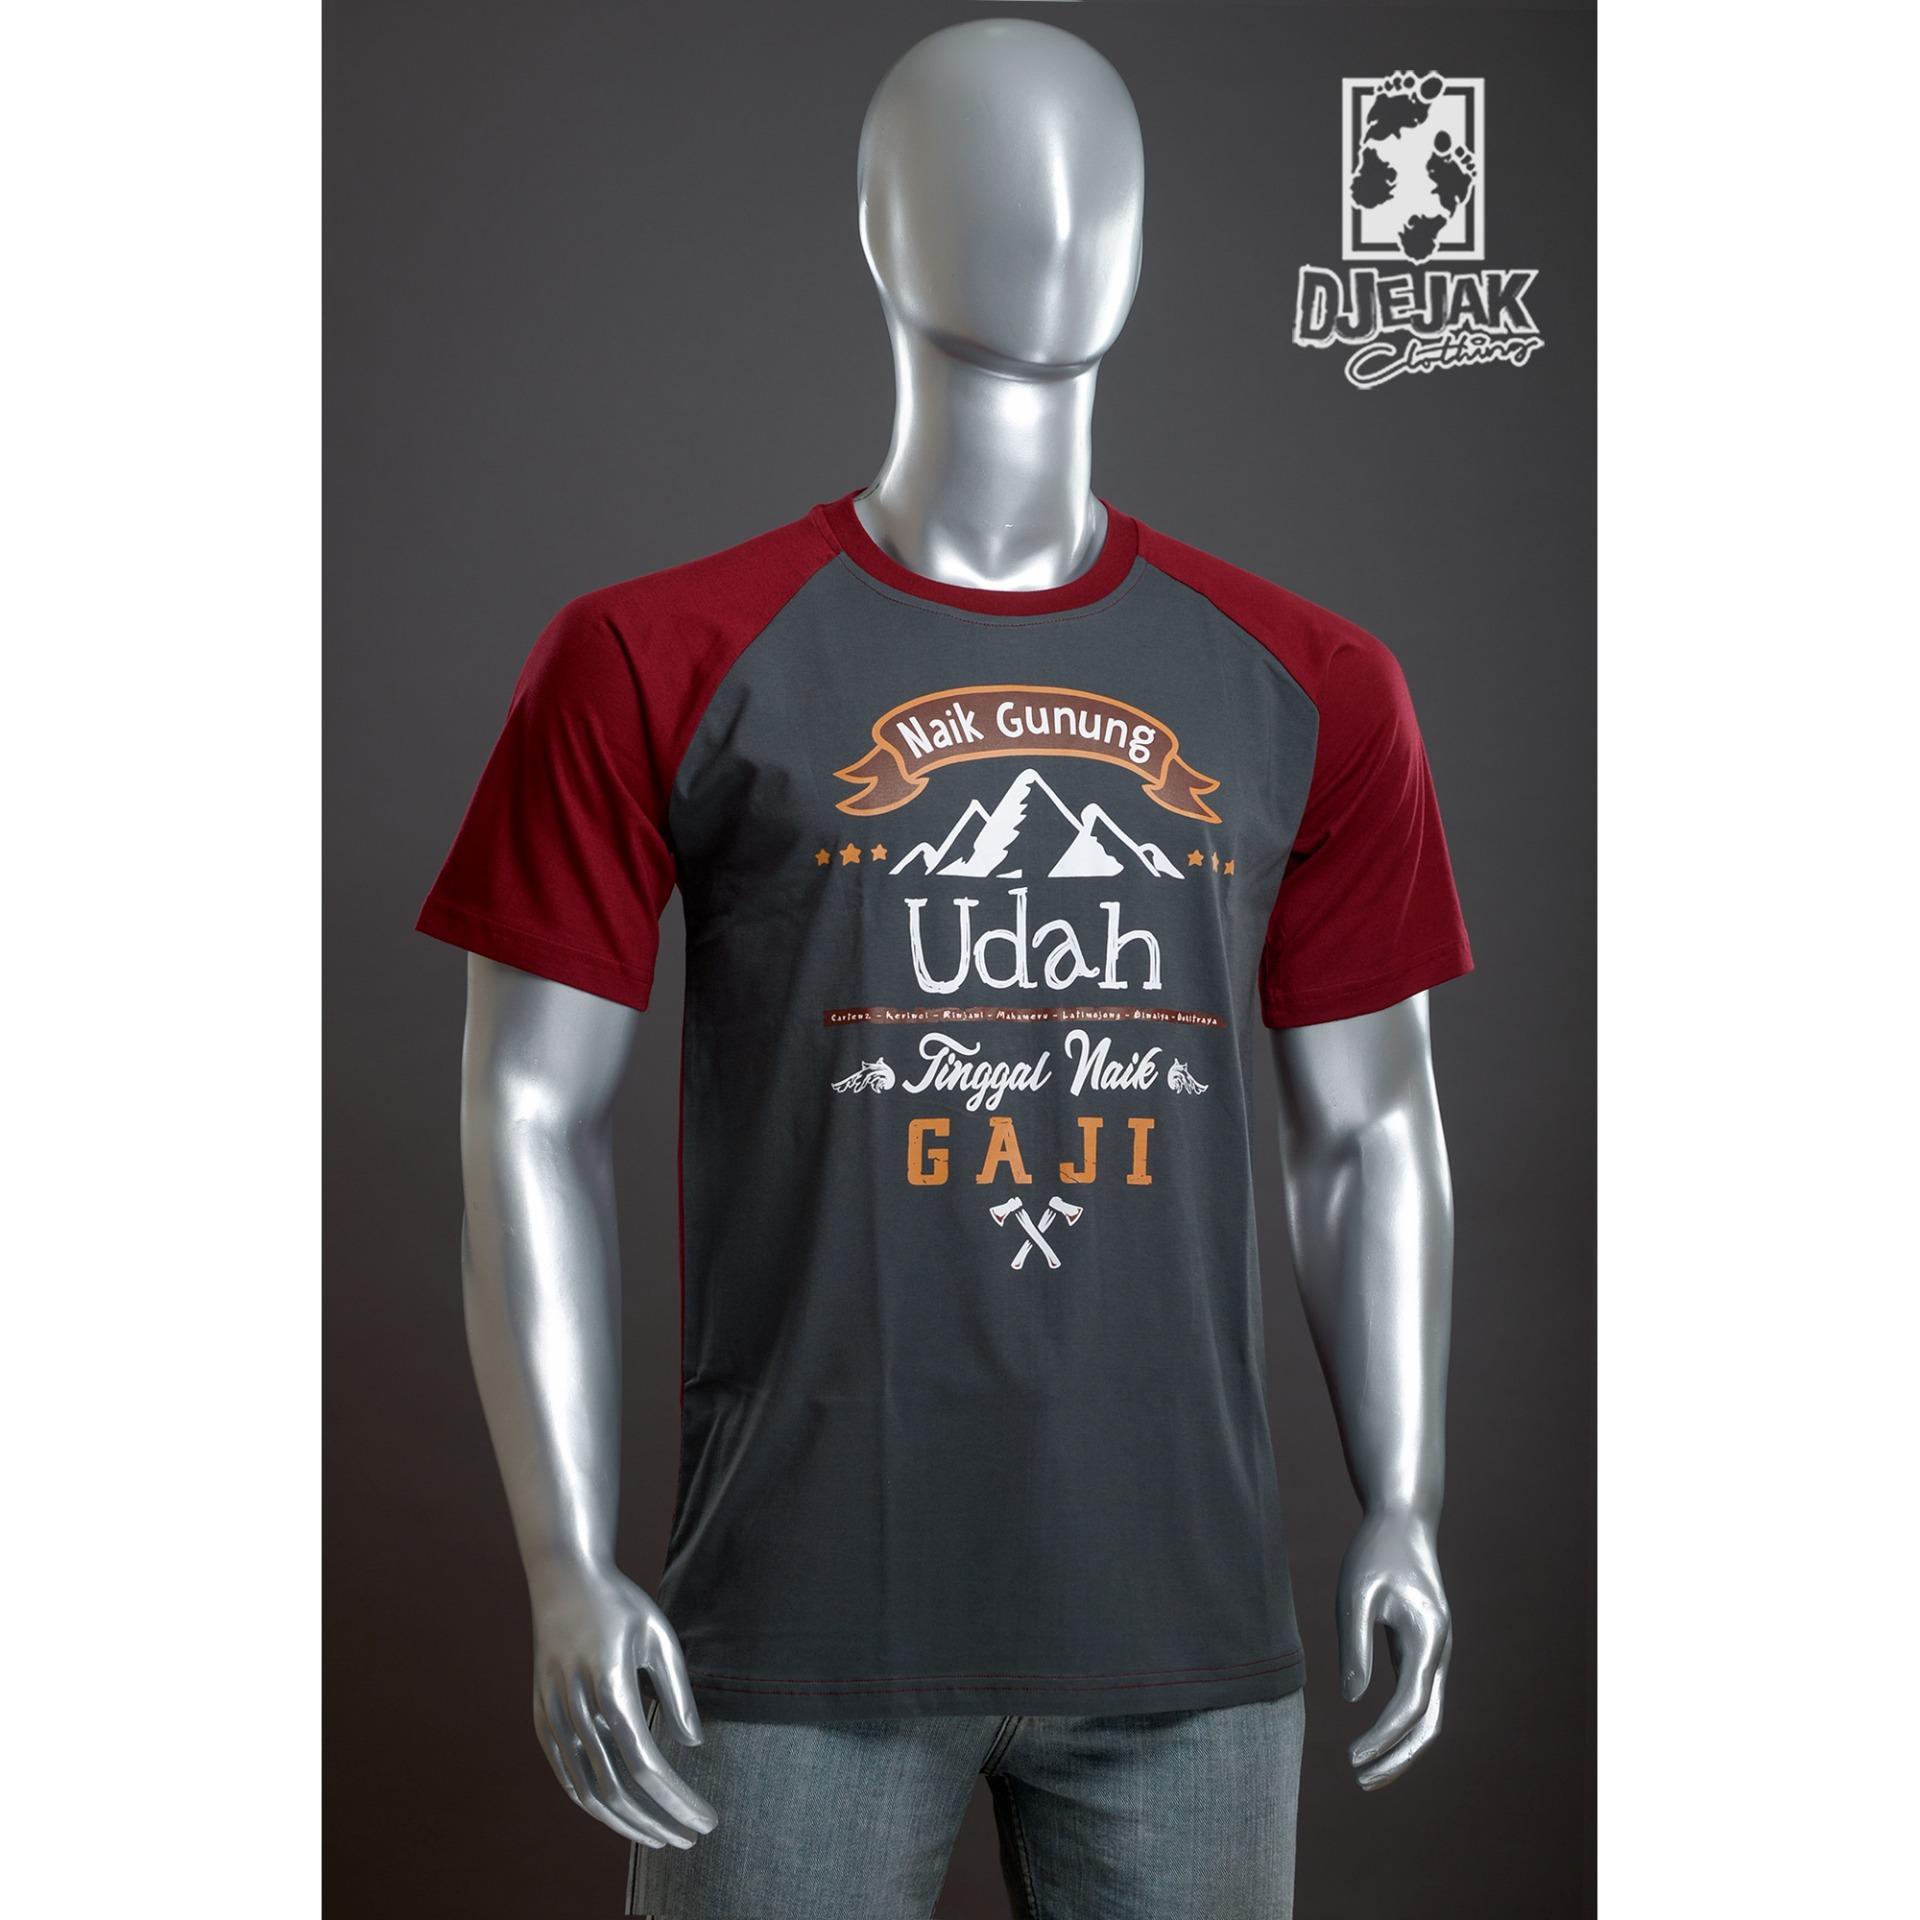 Jual Beli Online Djejak Clothing Tshirt Kaos Adventure Unisex Lengan Pendek Naik Gaji